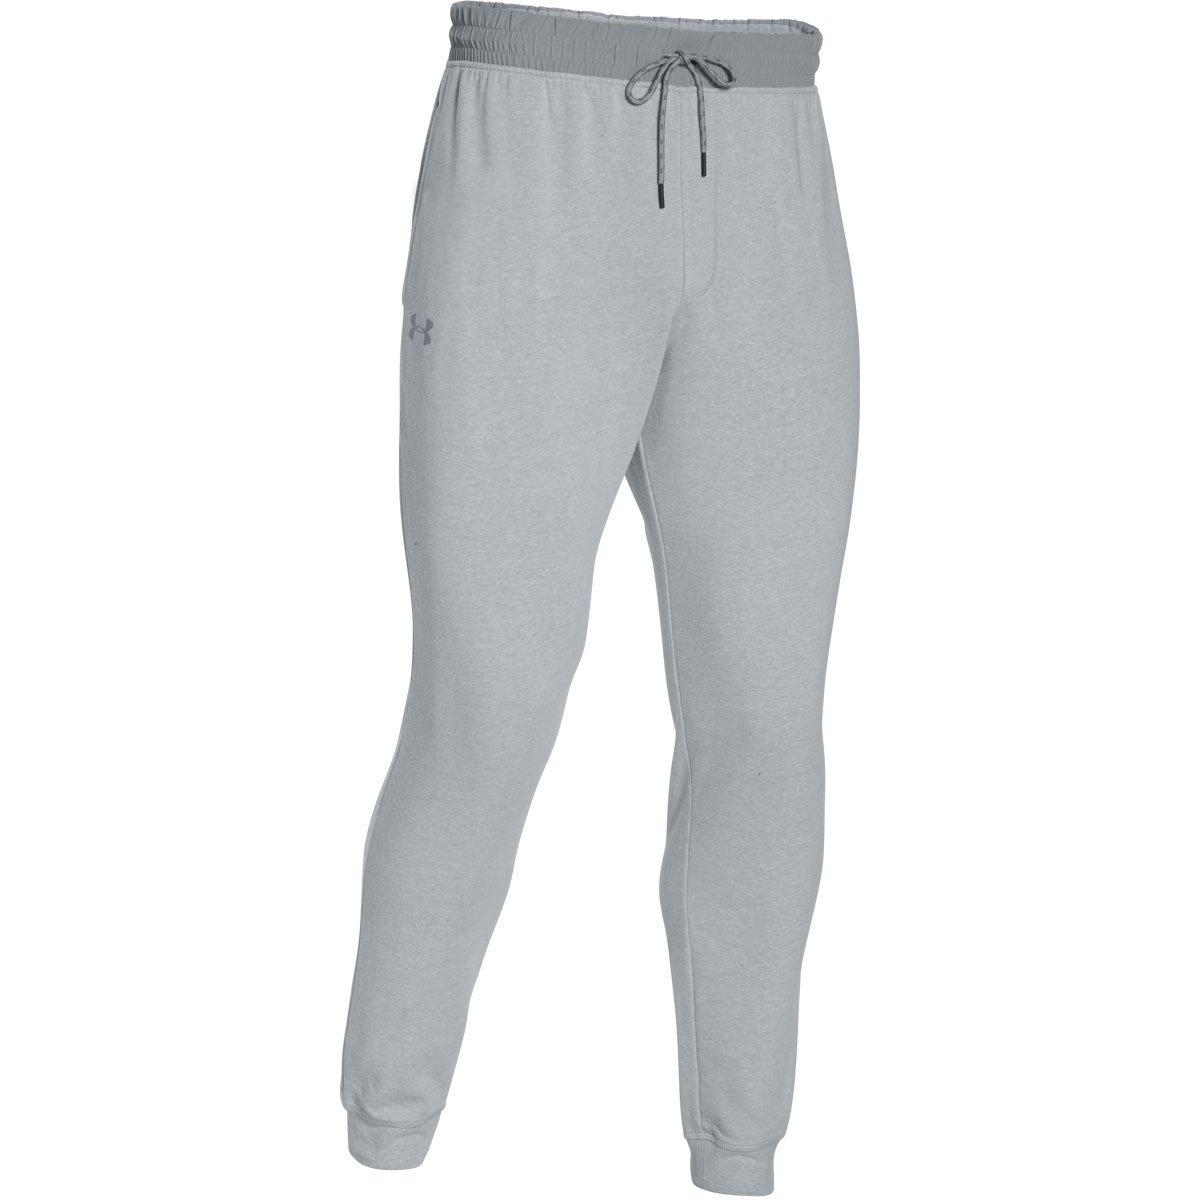 Under Armour Mens Ua Tri-Blend Fleece Jogger Pants